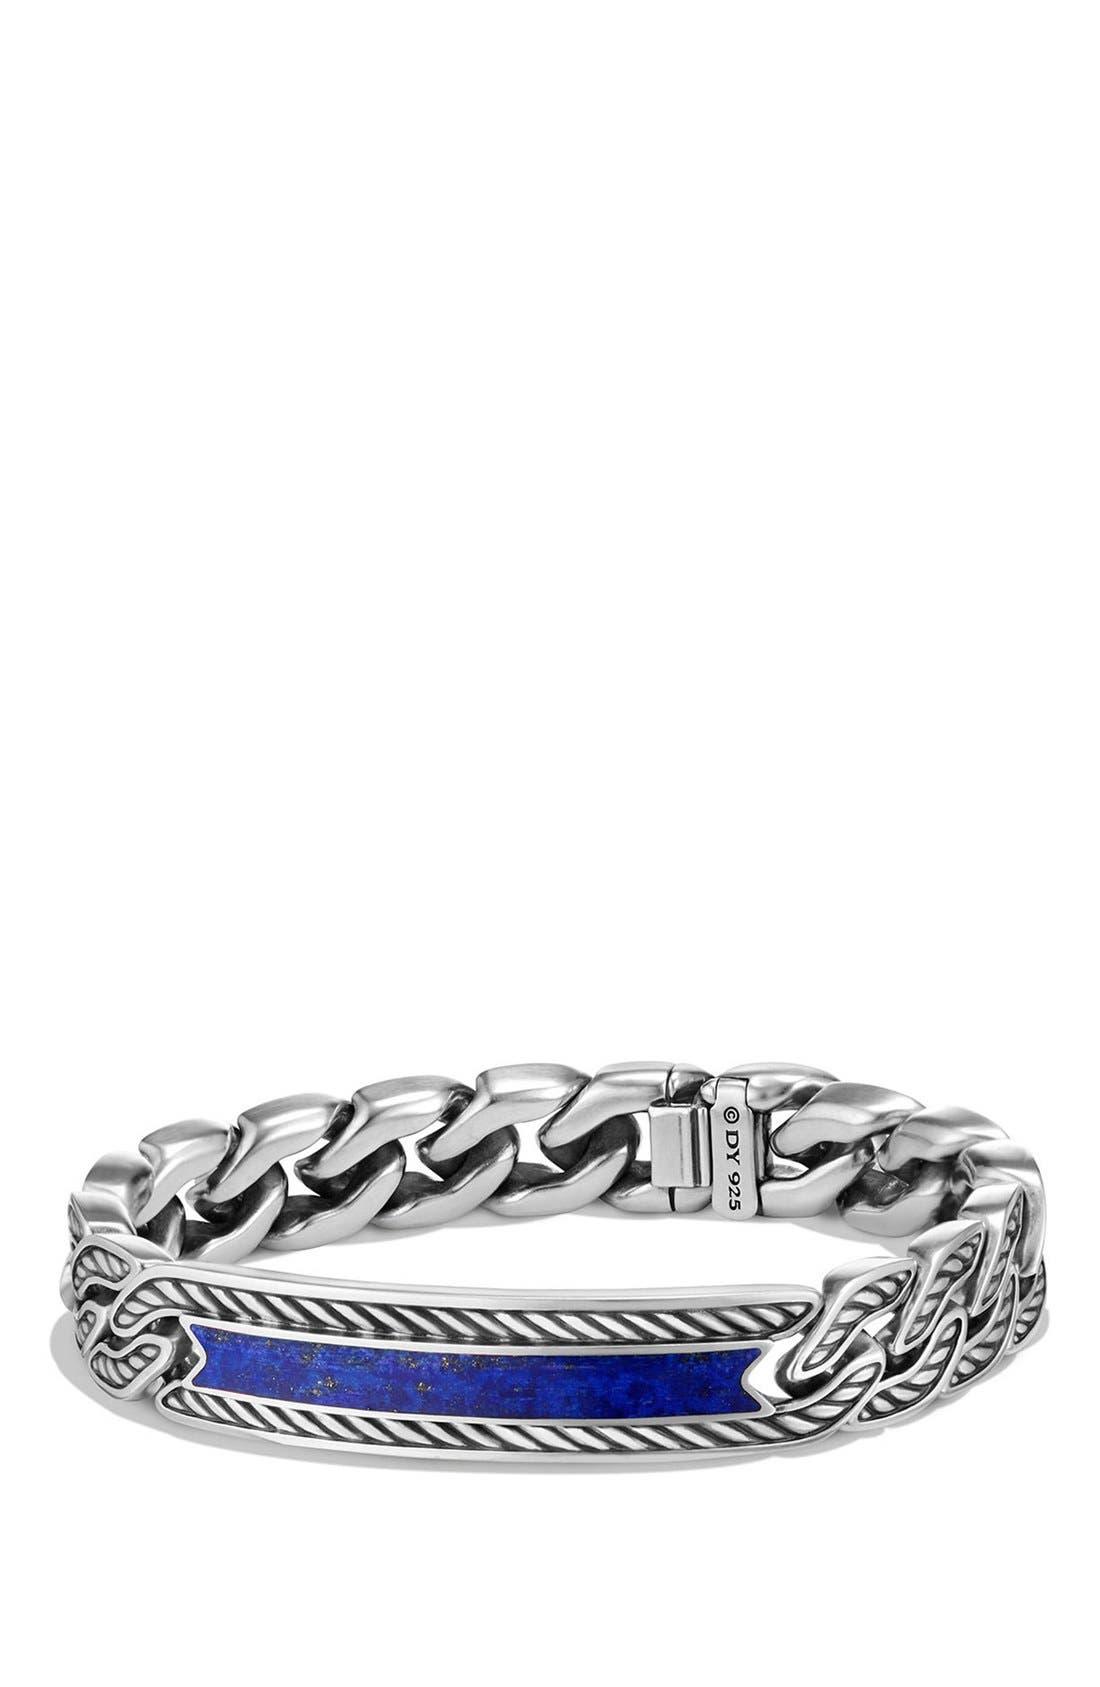 David Yurman 'Maritime' Curb Link ID Bracelet